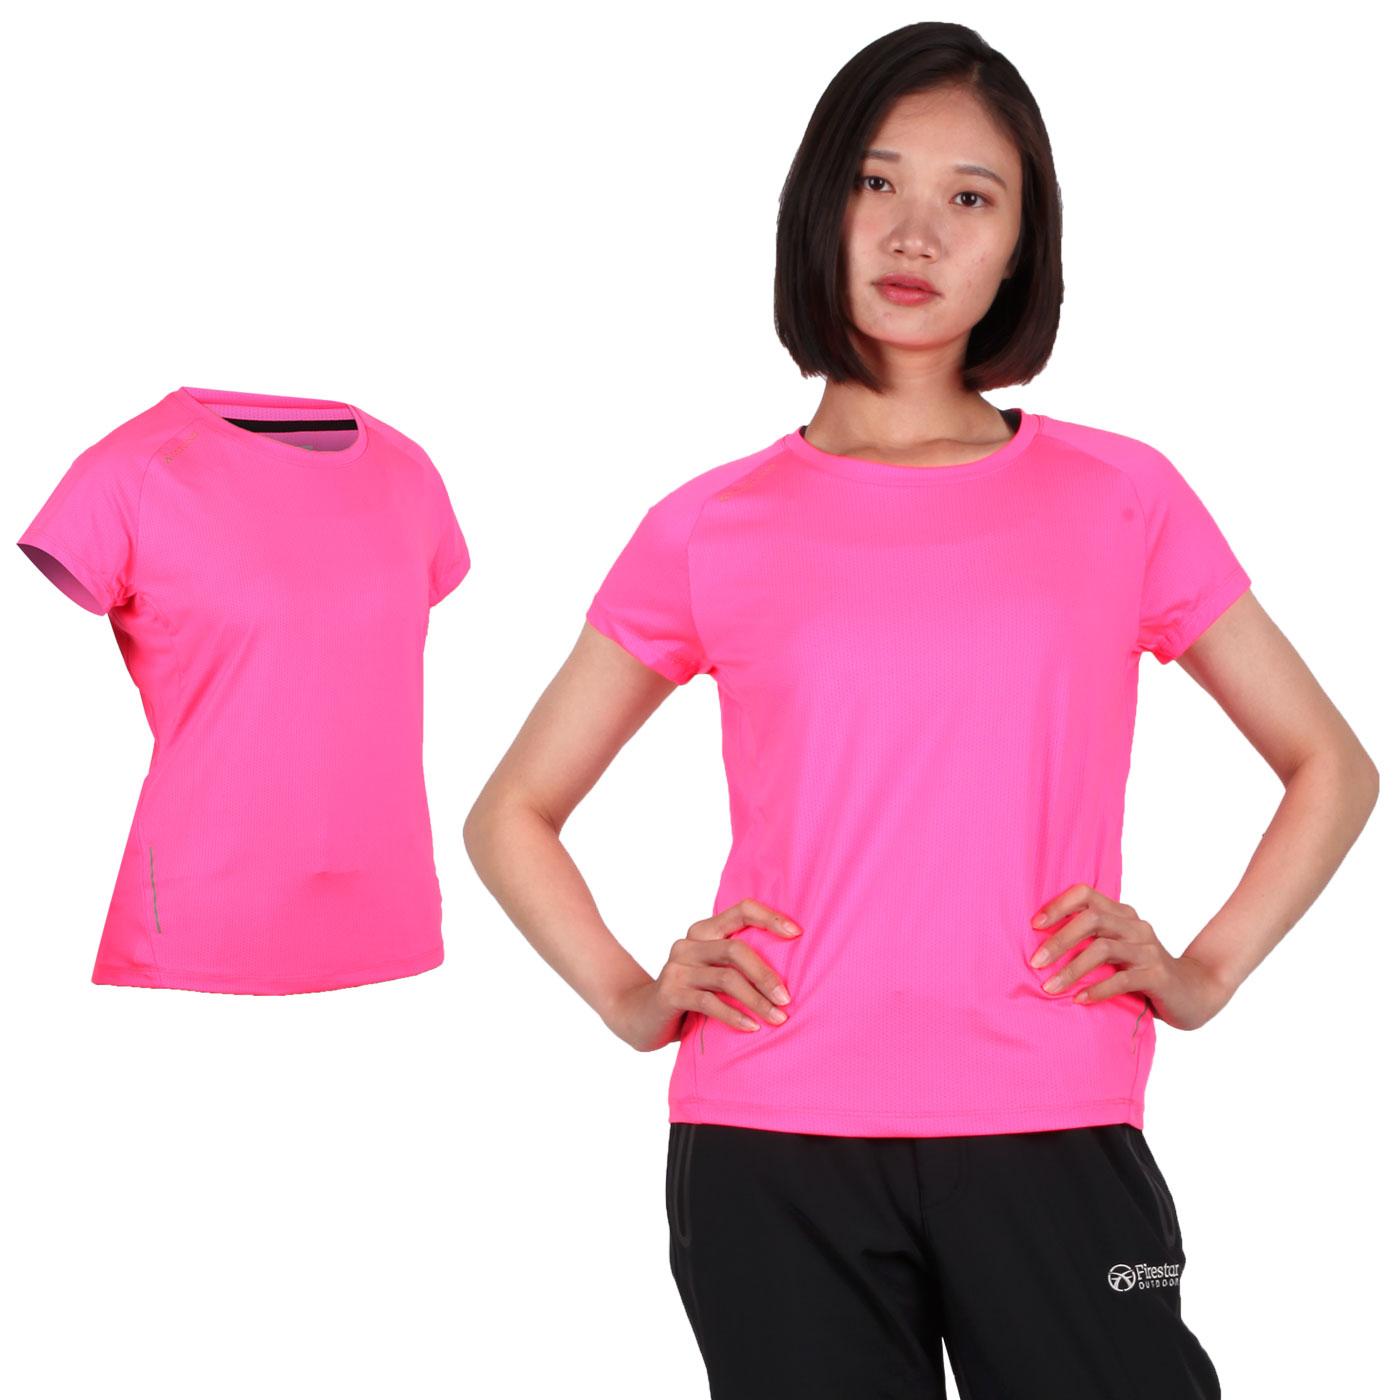 FIRESTAR 女款彈性短袖圓領T恤 DL965-10 - 亮桃紅